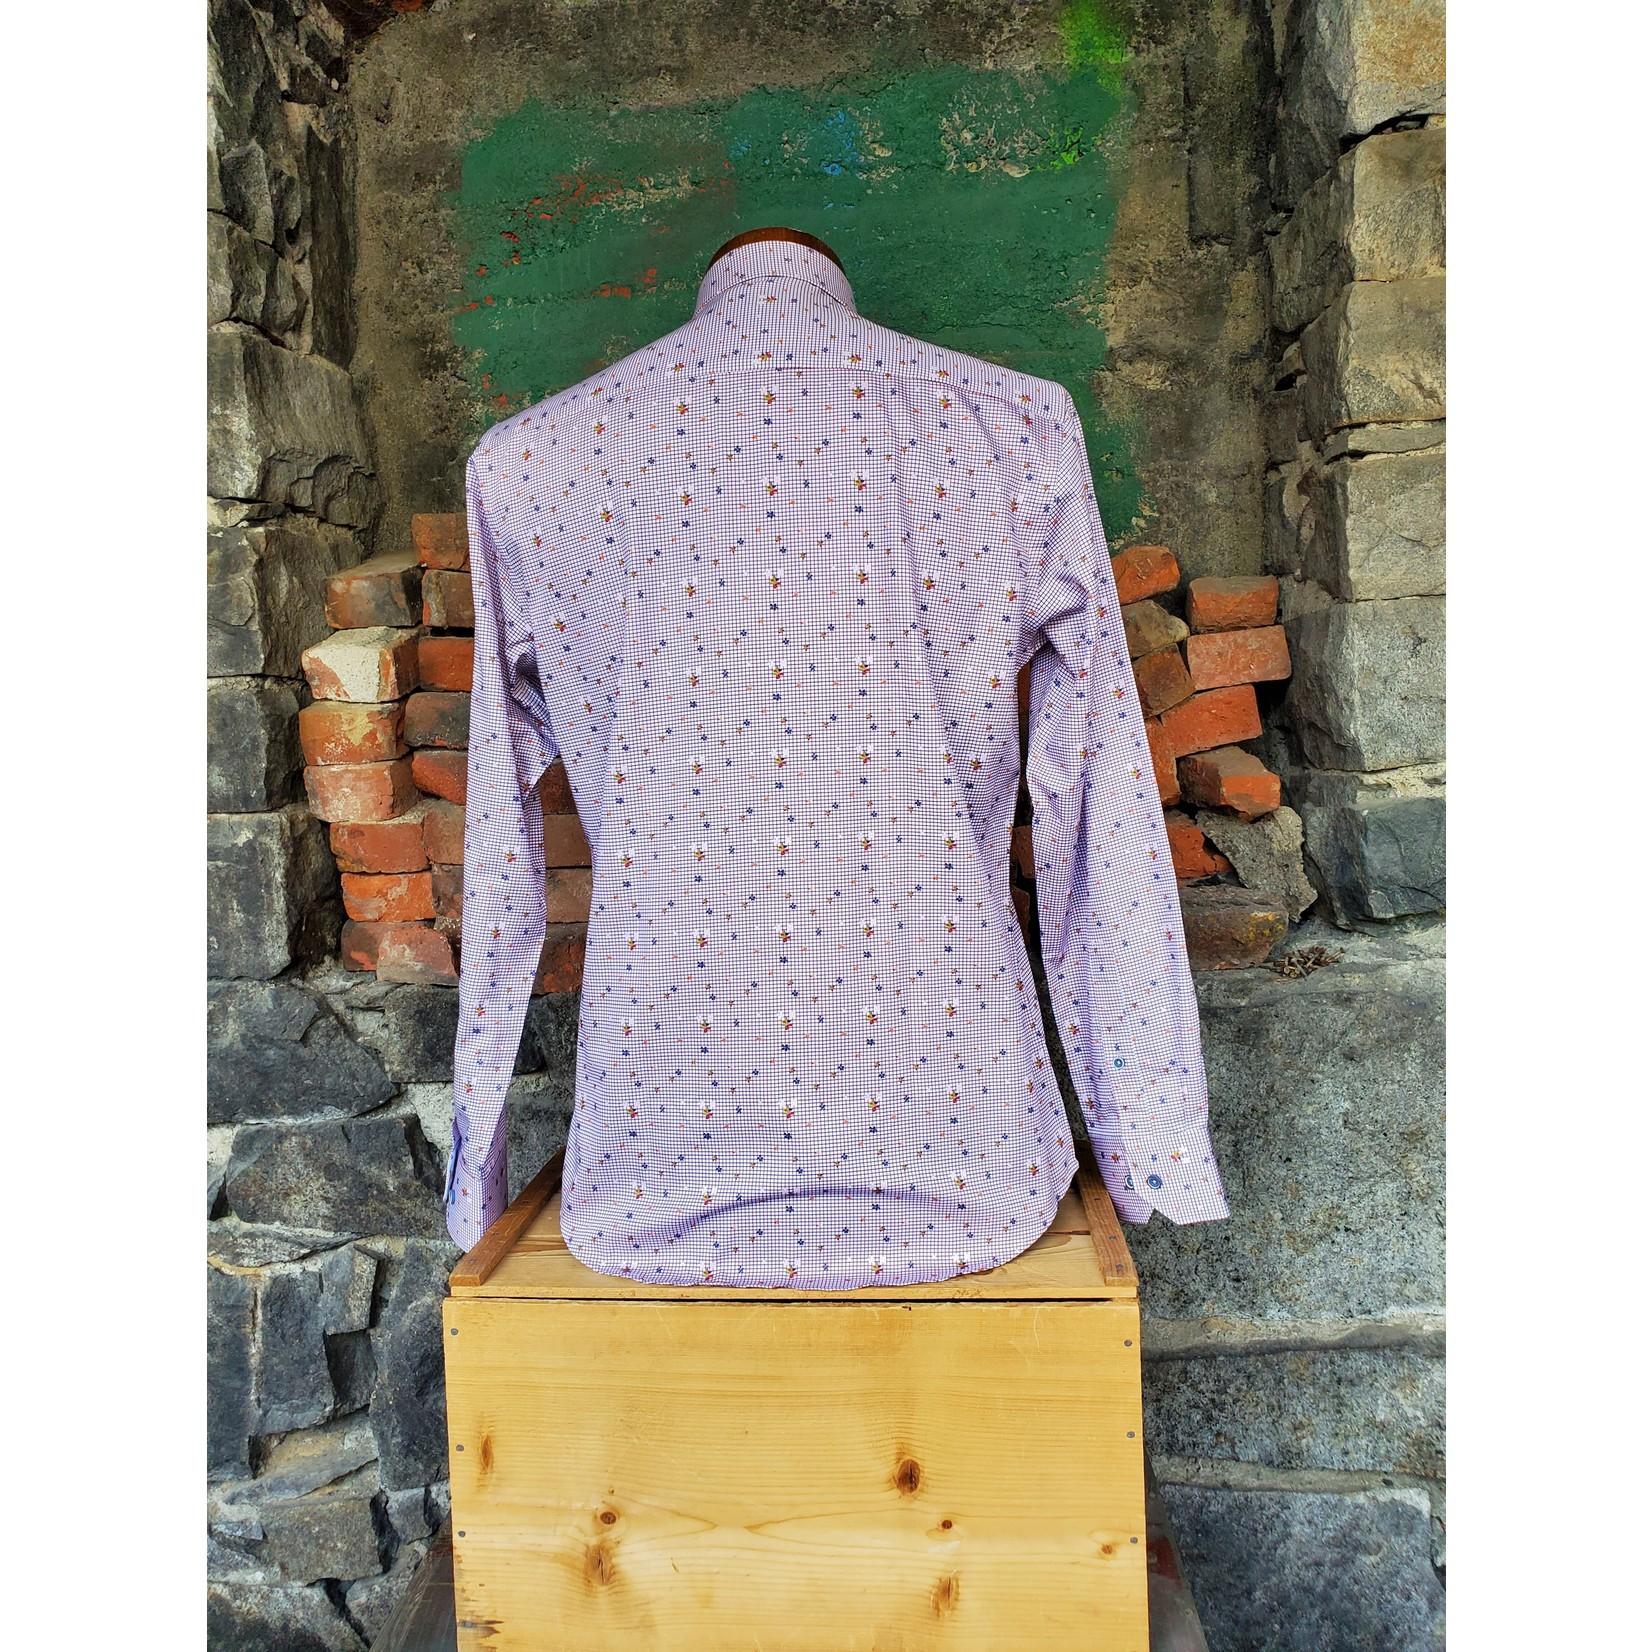 Oxley Floral Grid Print OS4OL5 Long-Sleeve Sportshirt